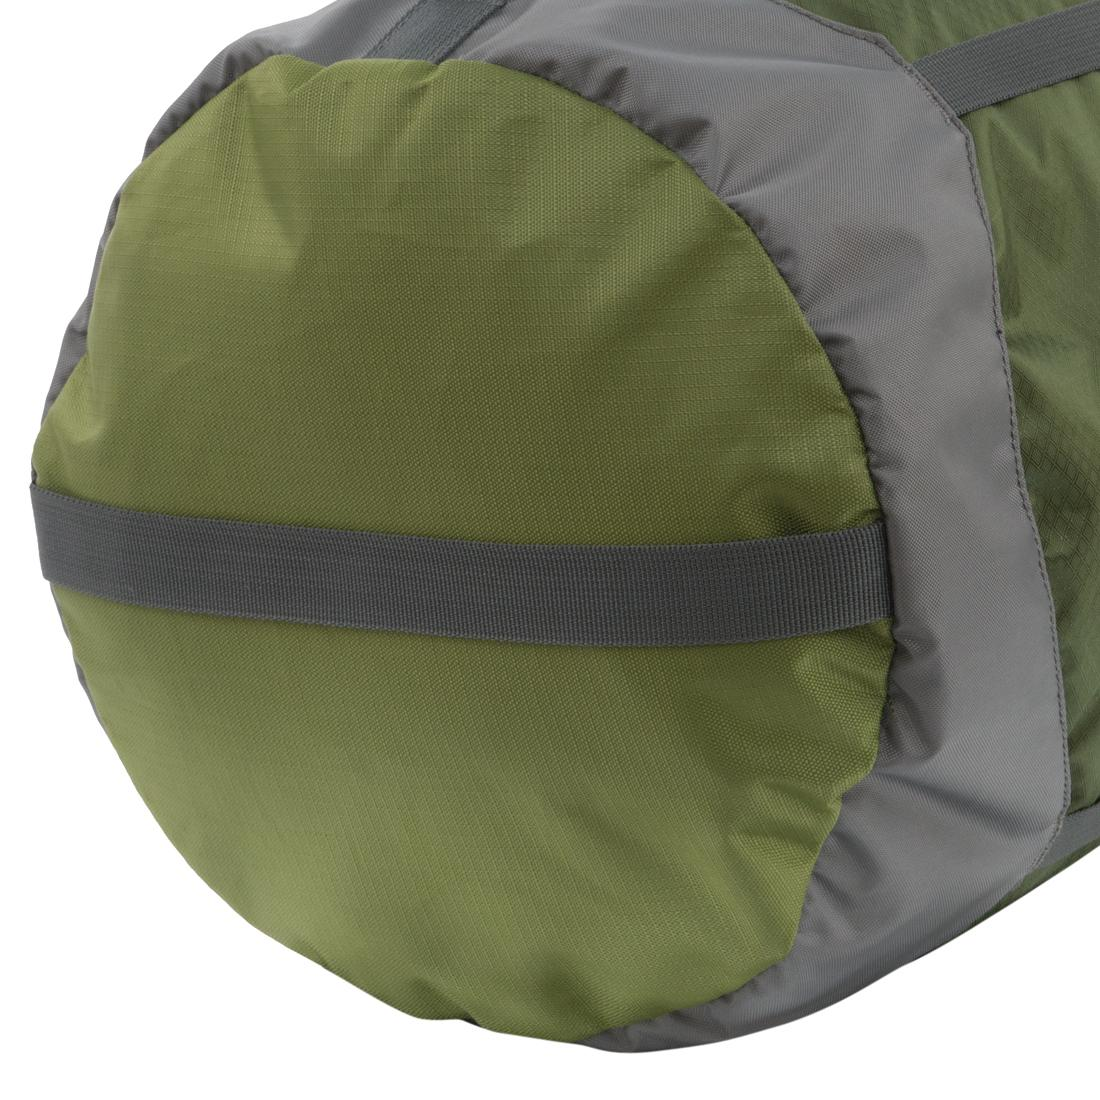 Amazon.com : ALPS Mountaineering Compression Sleeping Bag ...